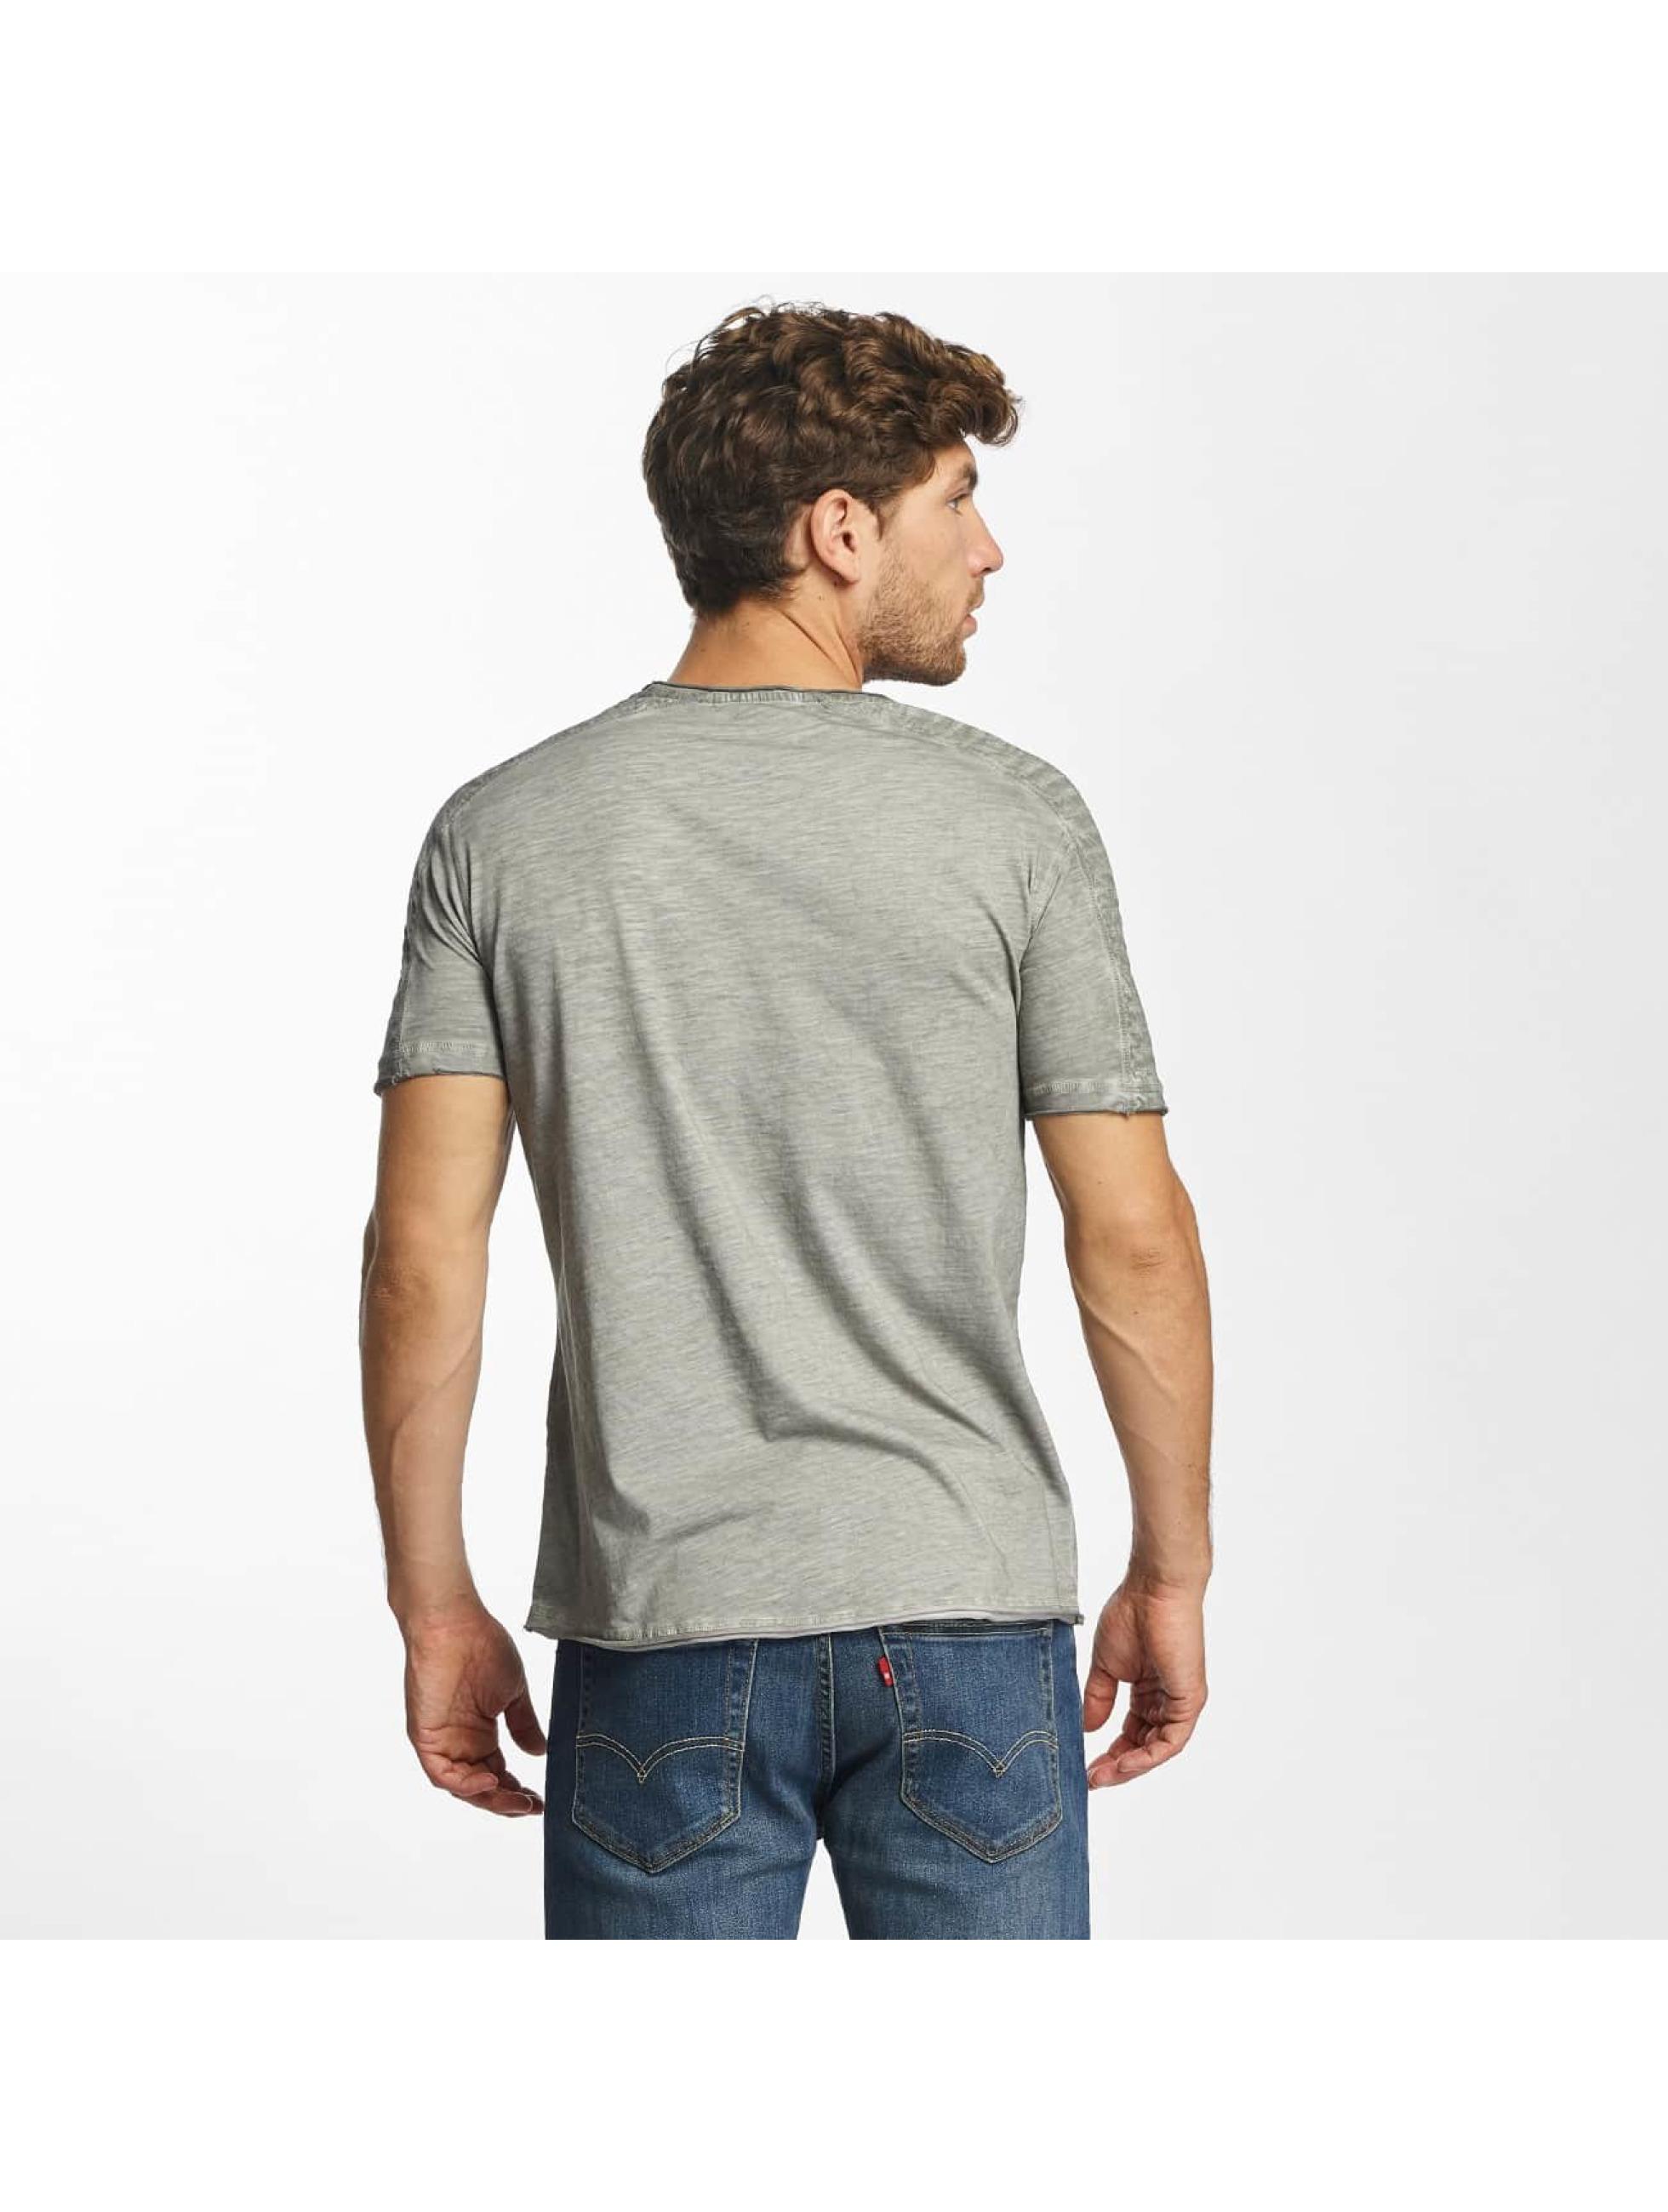 Red Bridge t-shirt Vintage Seam grijs